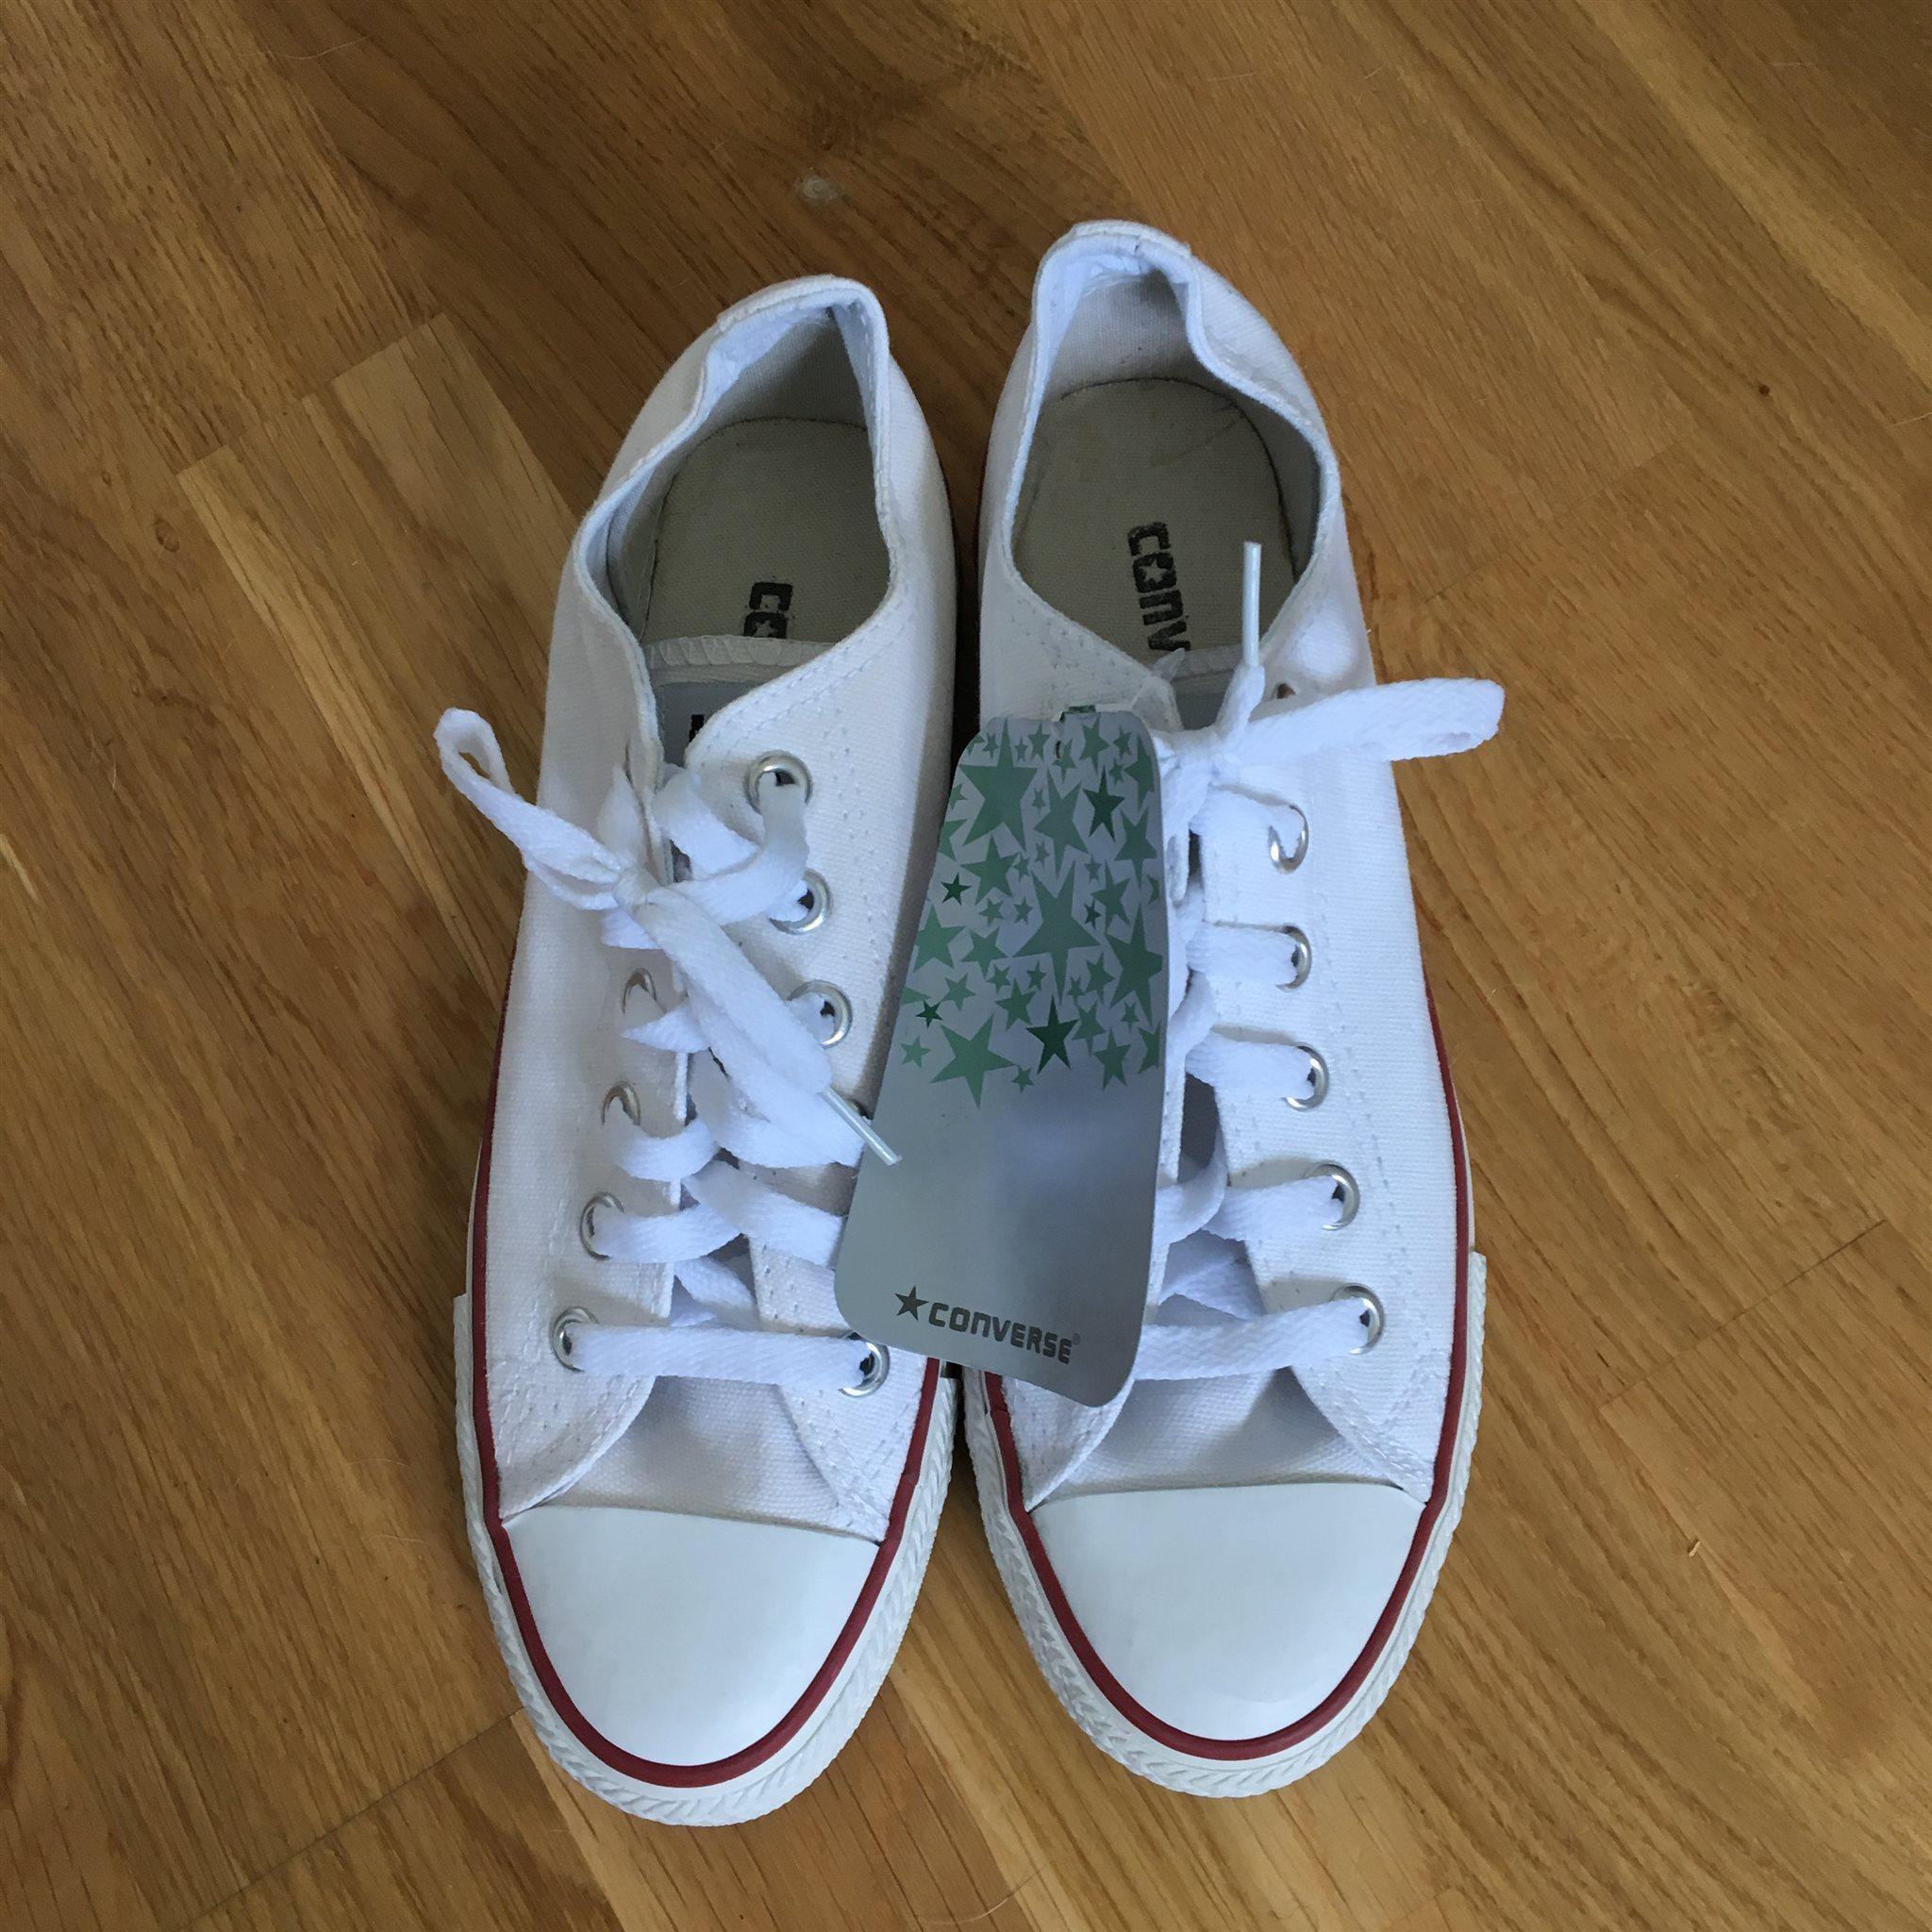 sports shoes 33ed7 52a08 Converse låga, vita. Storlek 38, 24 cm.